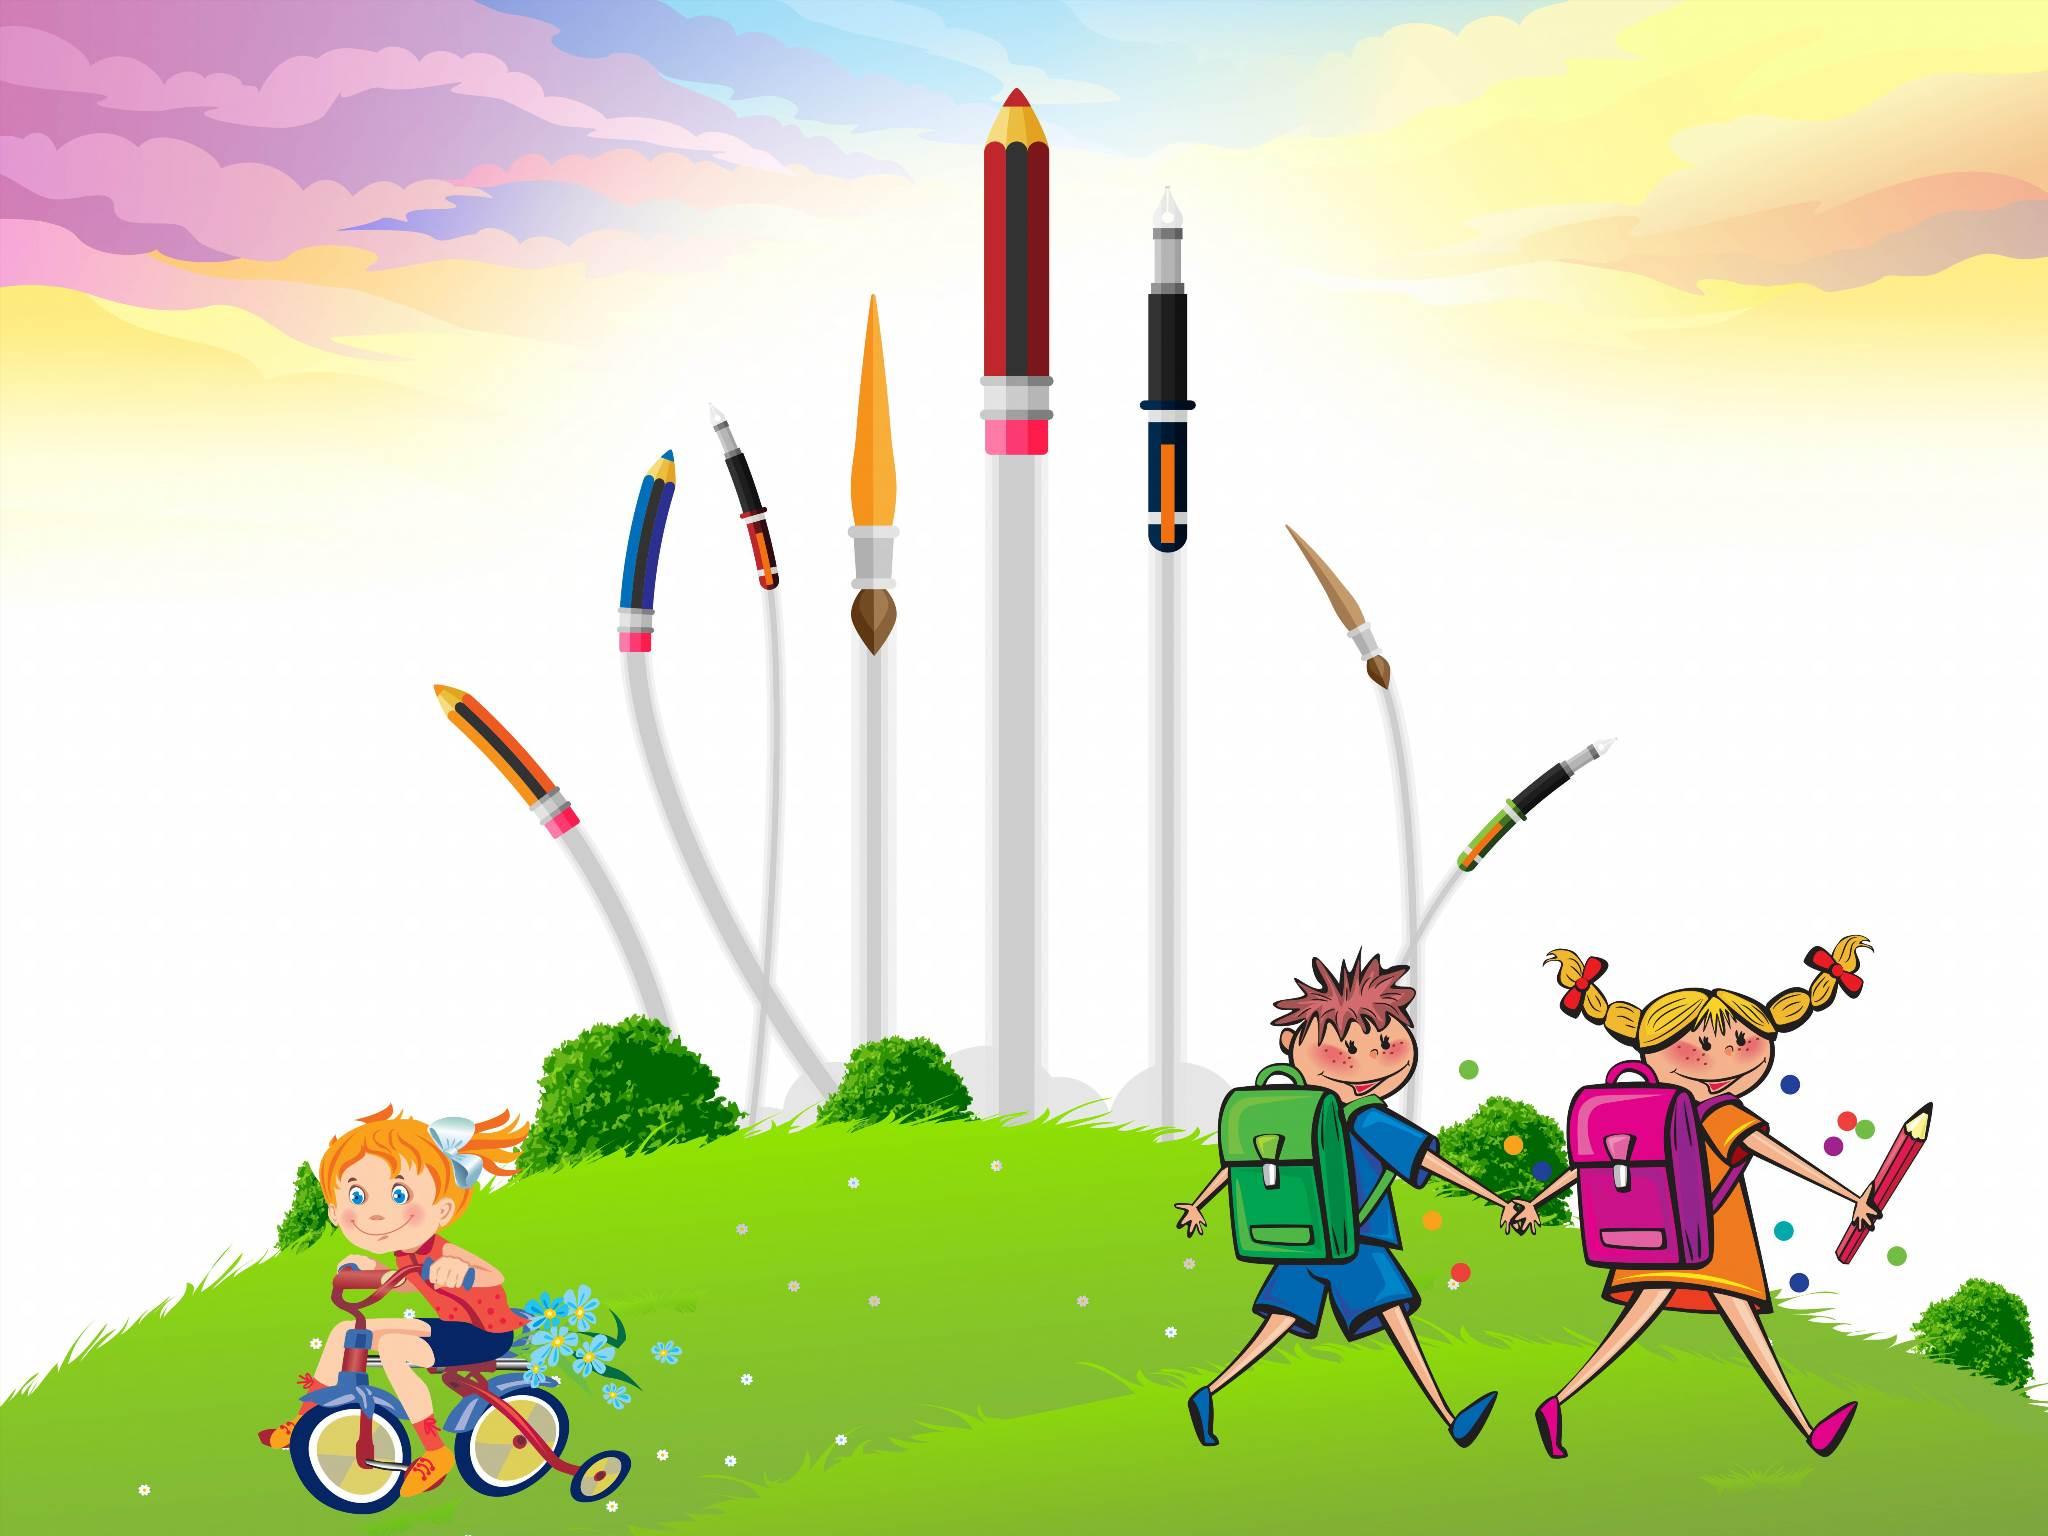 Wallpapers For Kids 52 Wallpapers – Wallpapers HD